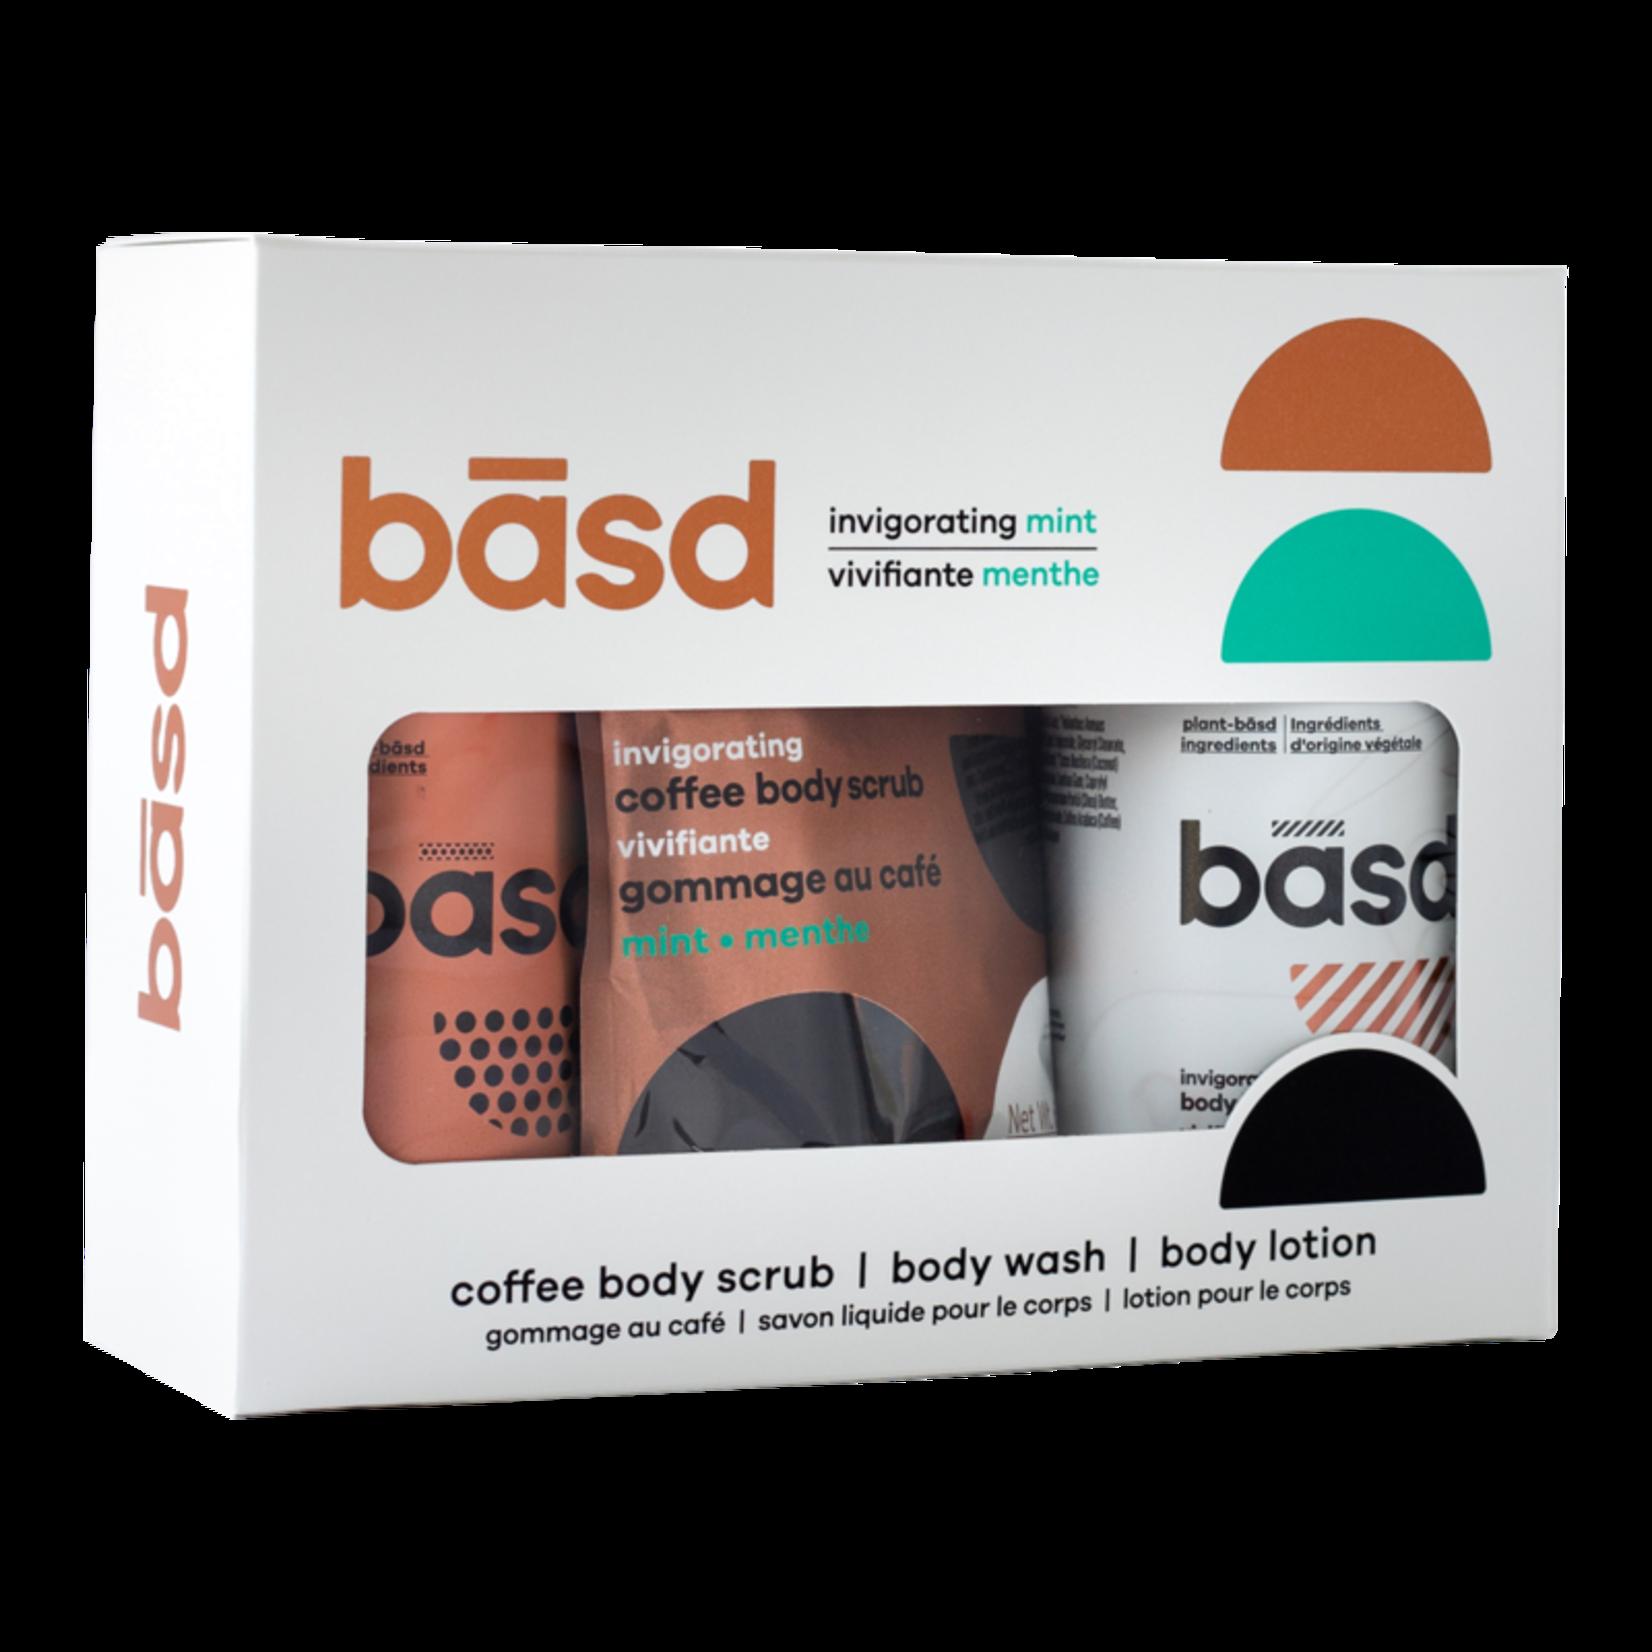 Basd BASD Gift Set- Invigorating Mint